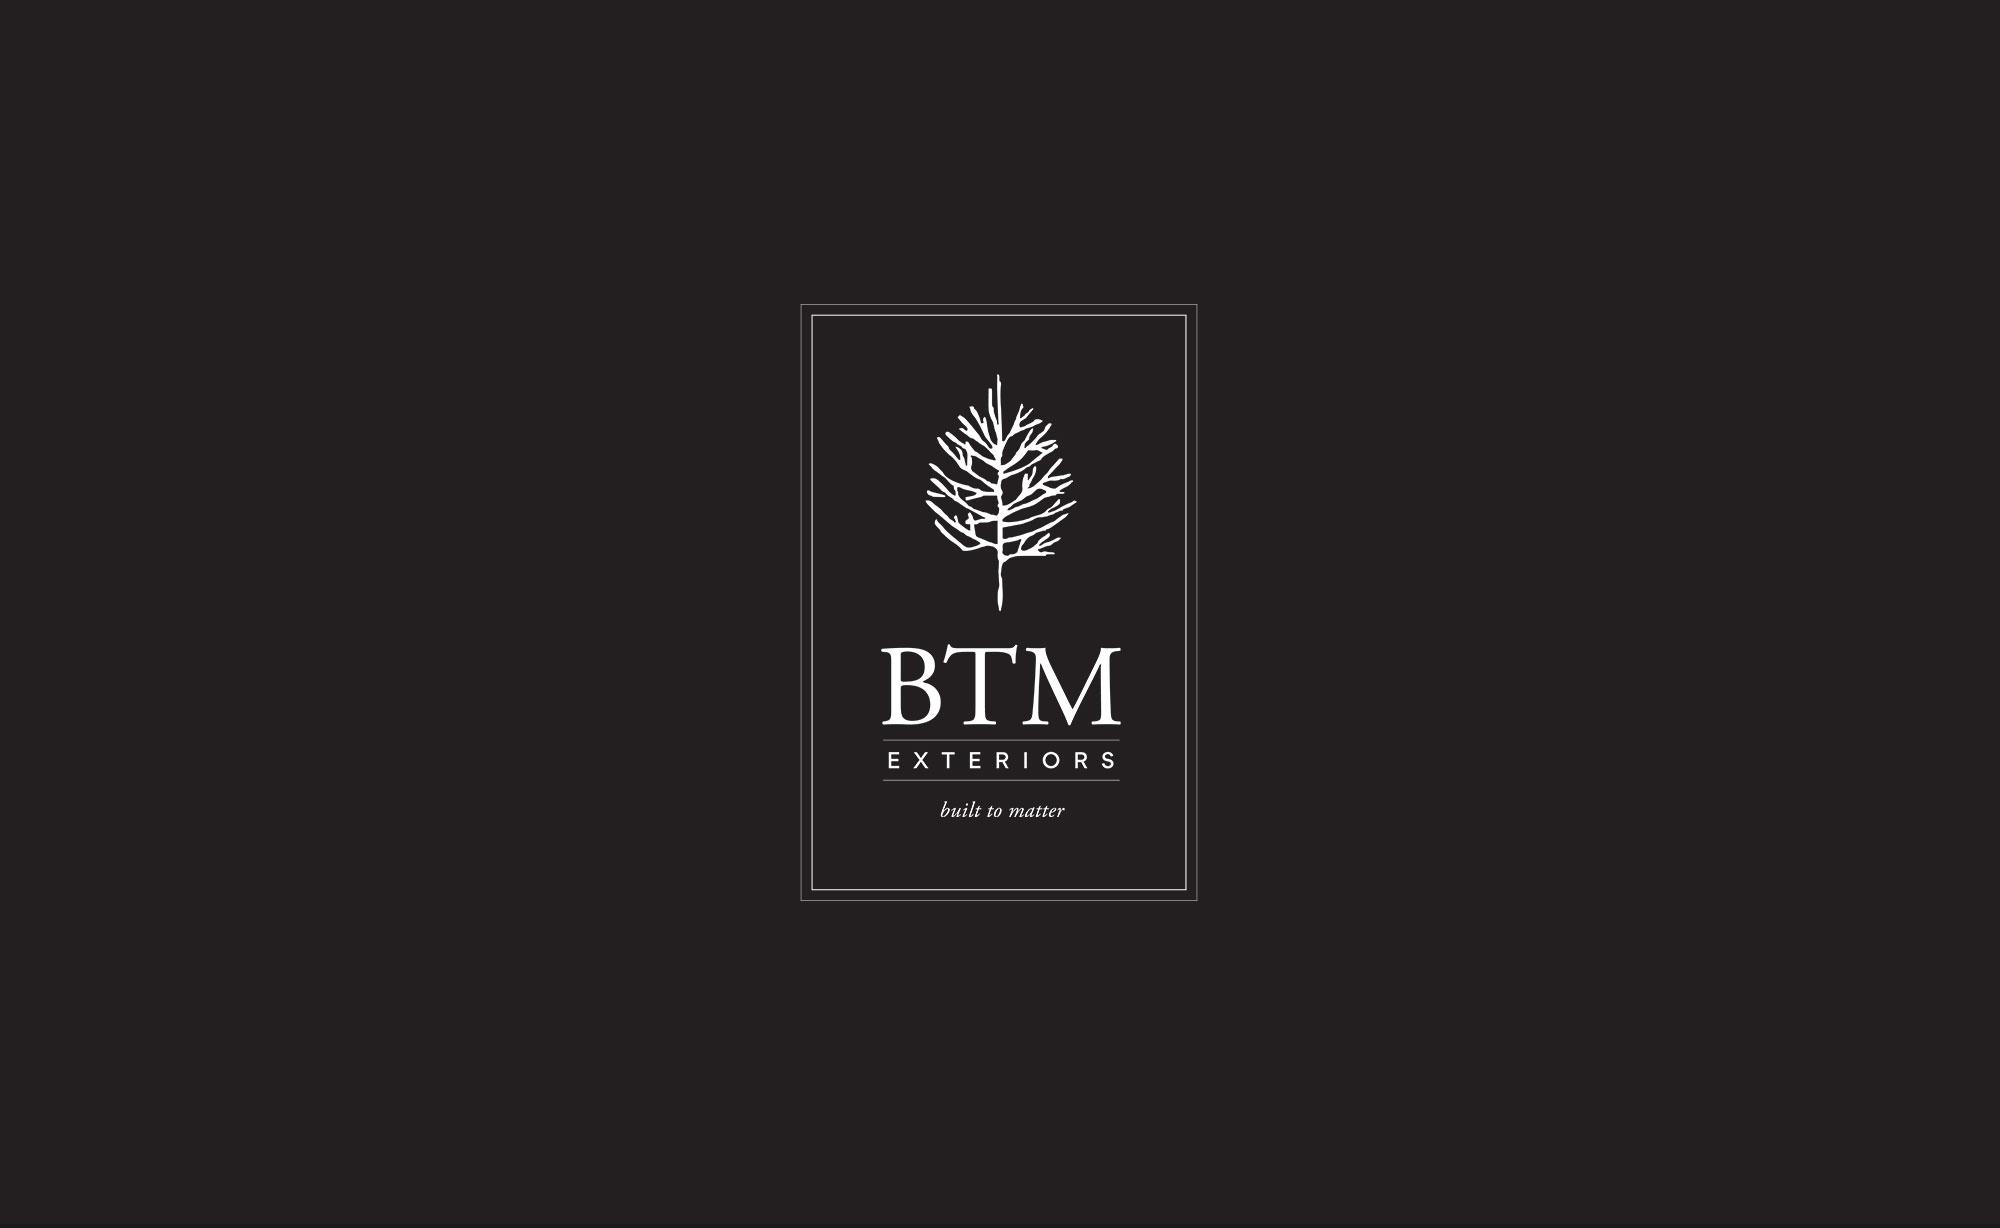 ©-Chris-Rae-Design-BTM-Exteriors-Brand-Logo-Identity-Design-03.jpg